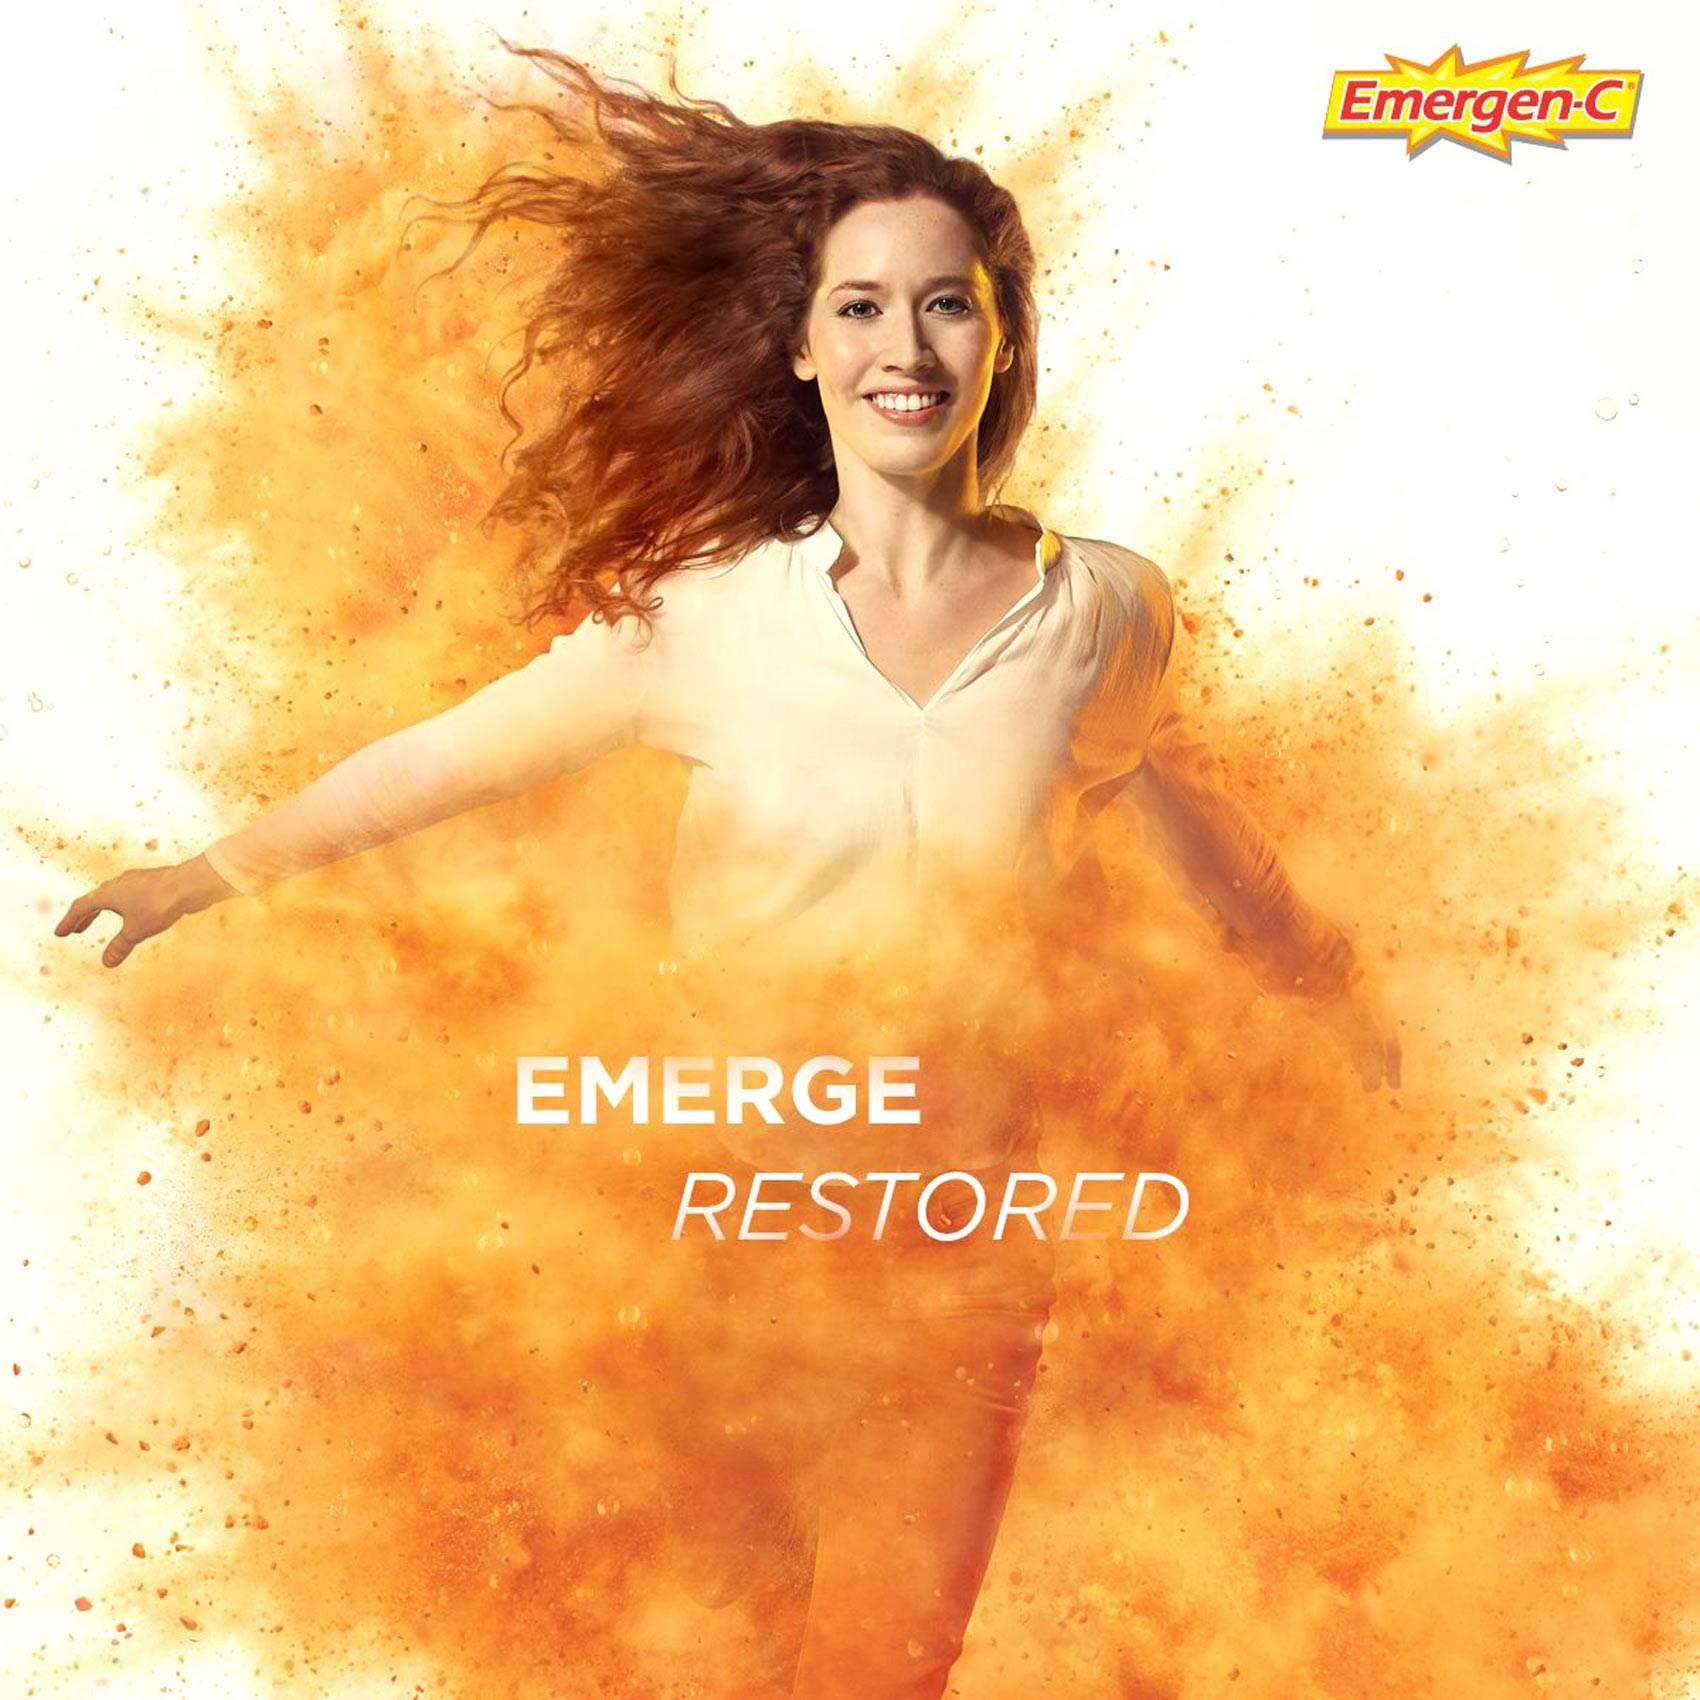 emergencweb-copy.jpg